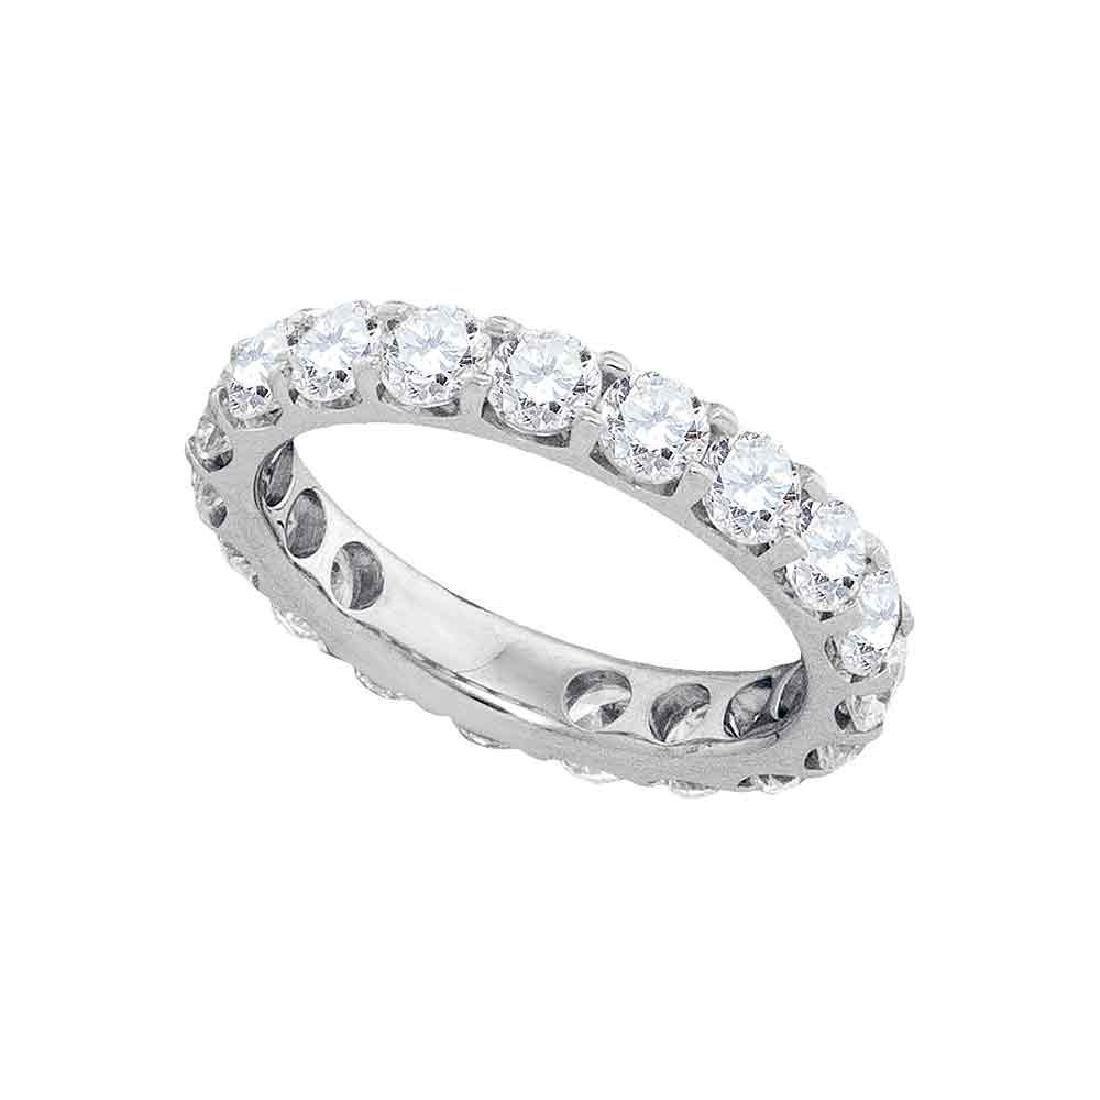 3.02 CTW Diamond Wedding Ring 14KT White Gold -